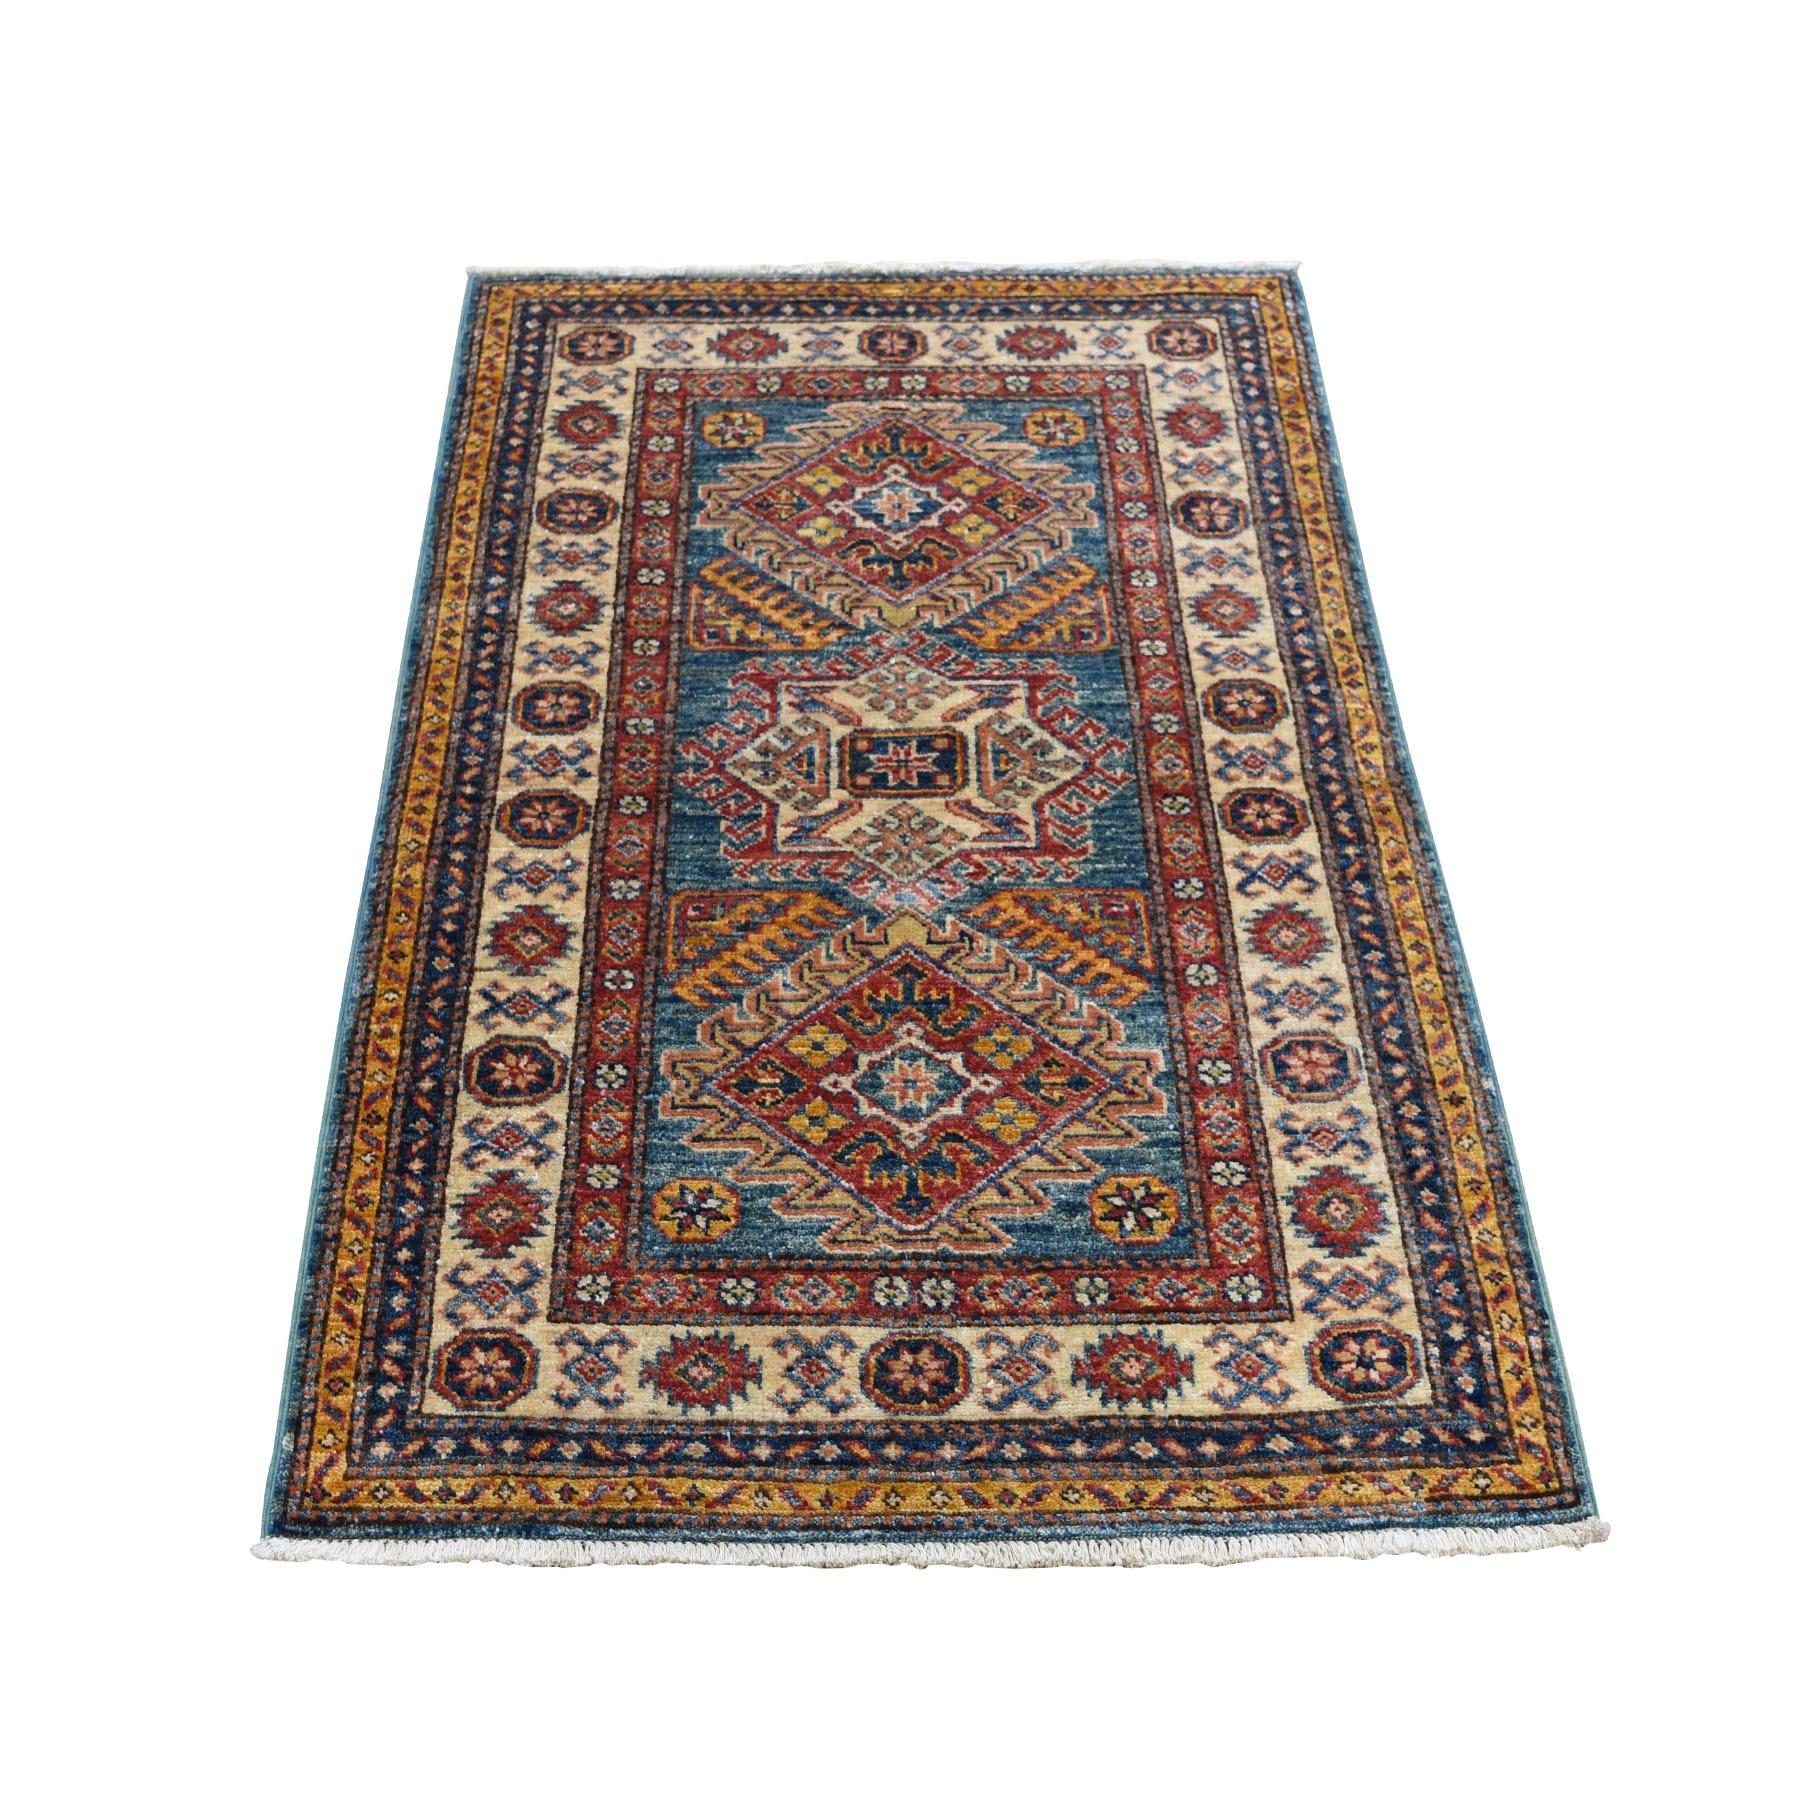 "2'9""X3'9"" Blue Super Kazak Geometric Design Pure Wool Hand Knotted Oriental Rug moad7ad9"